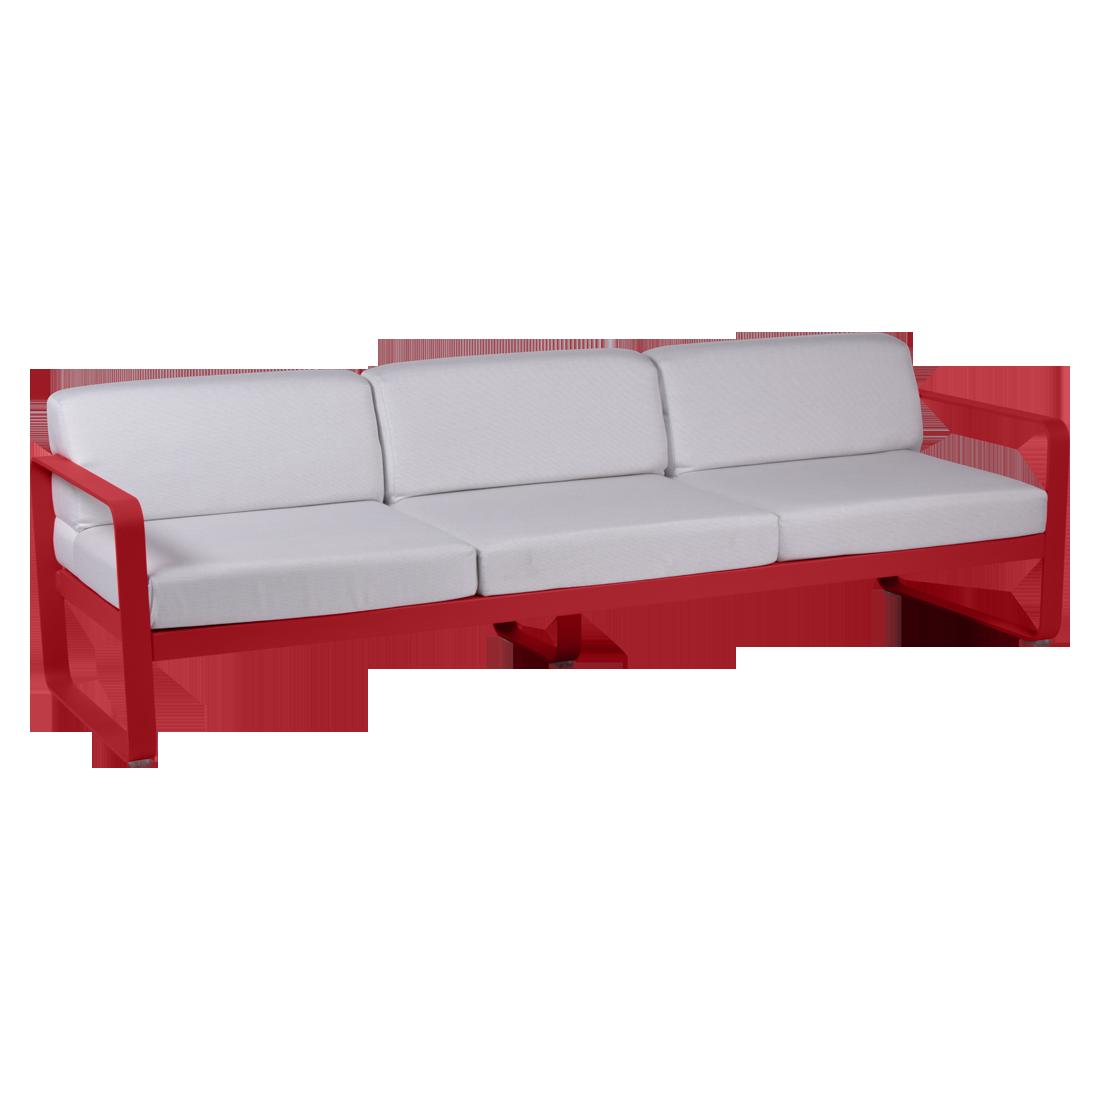 Fermob Bellevie sofa